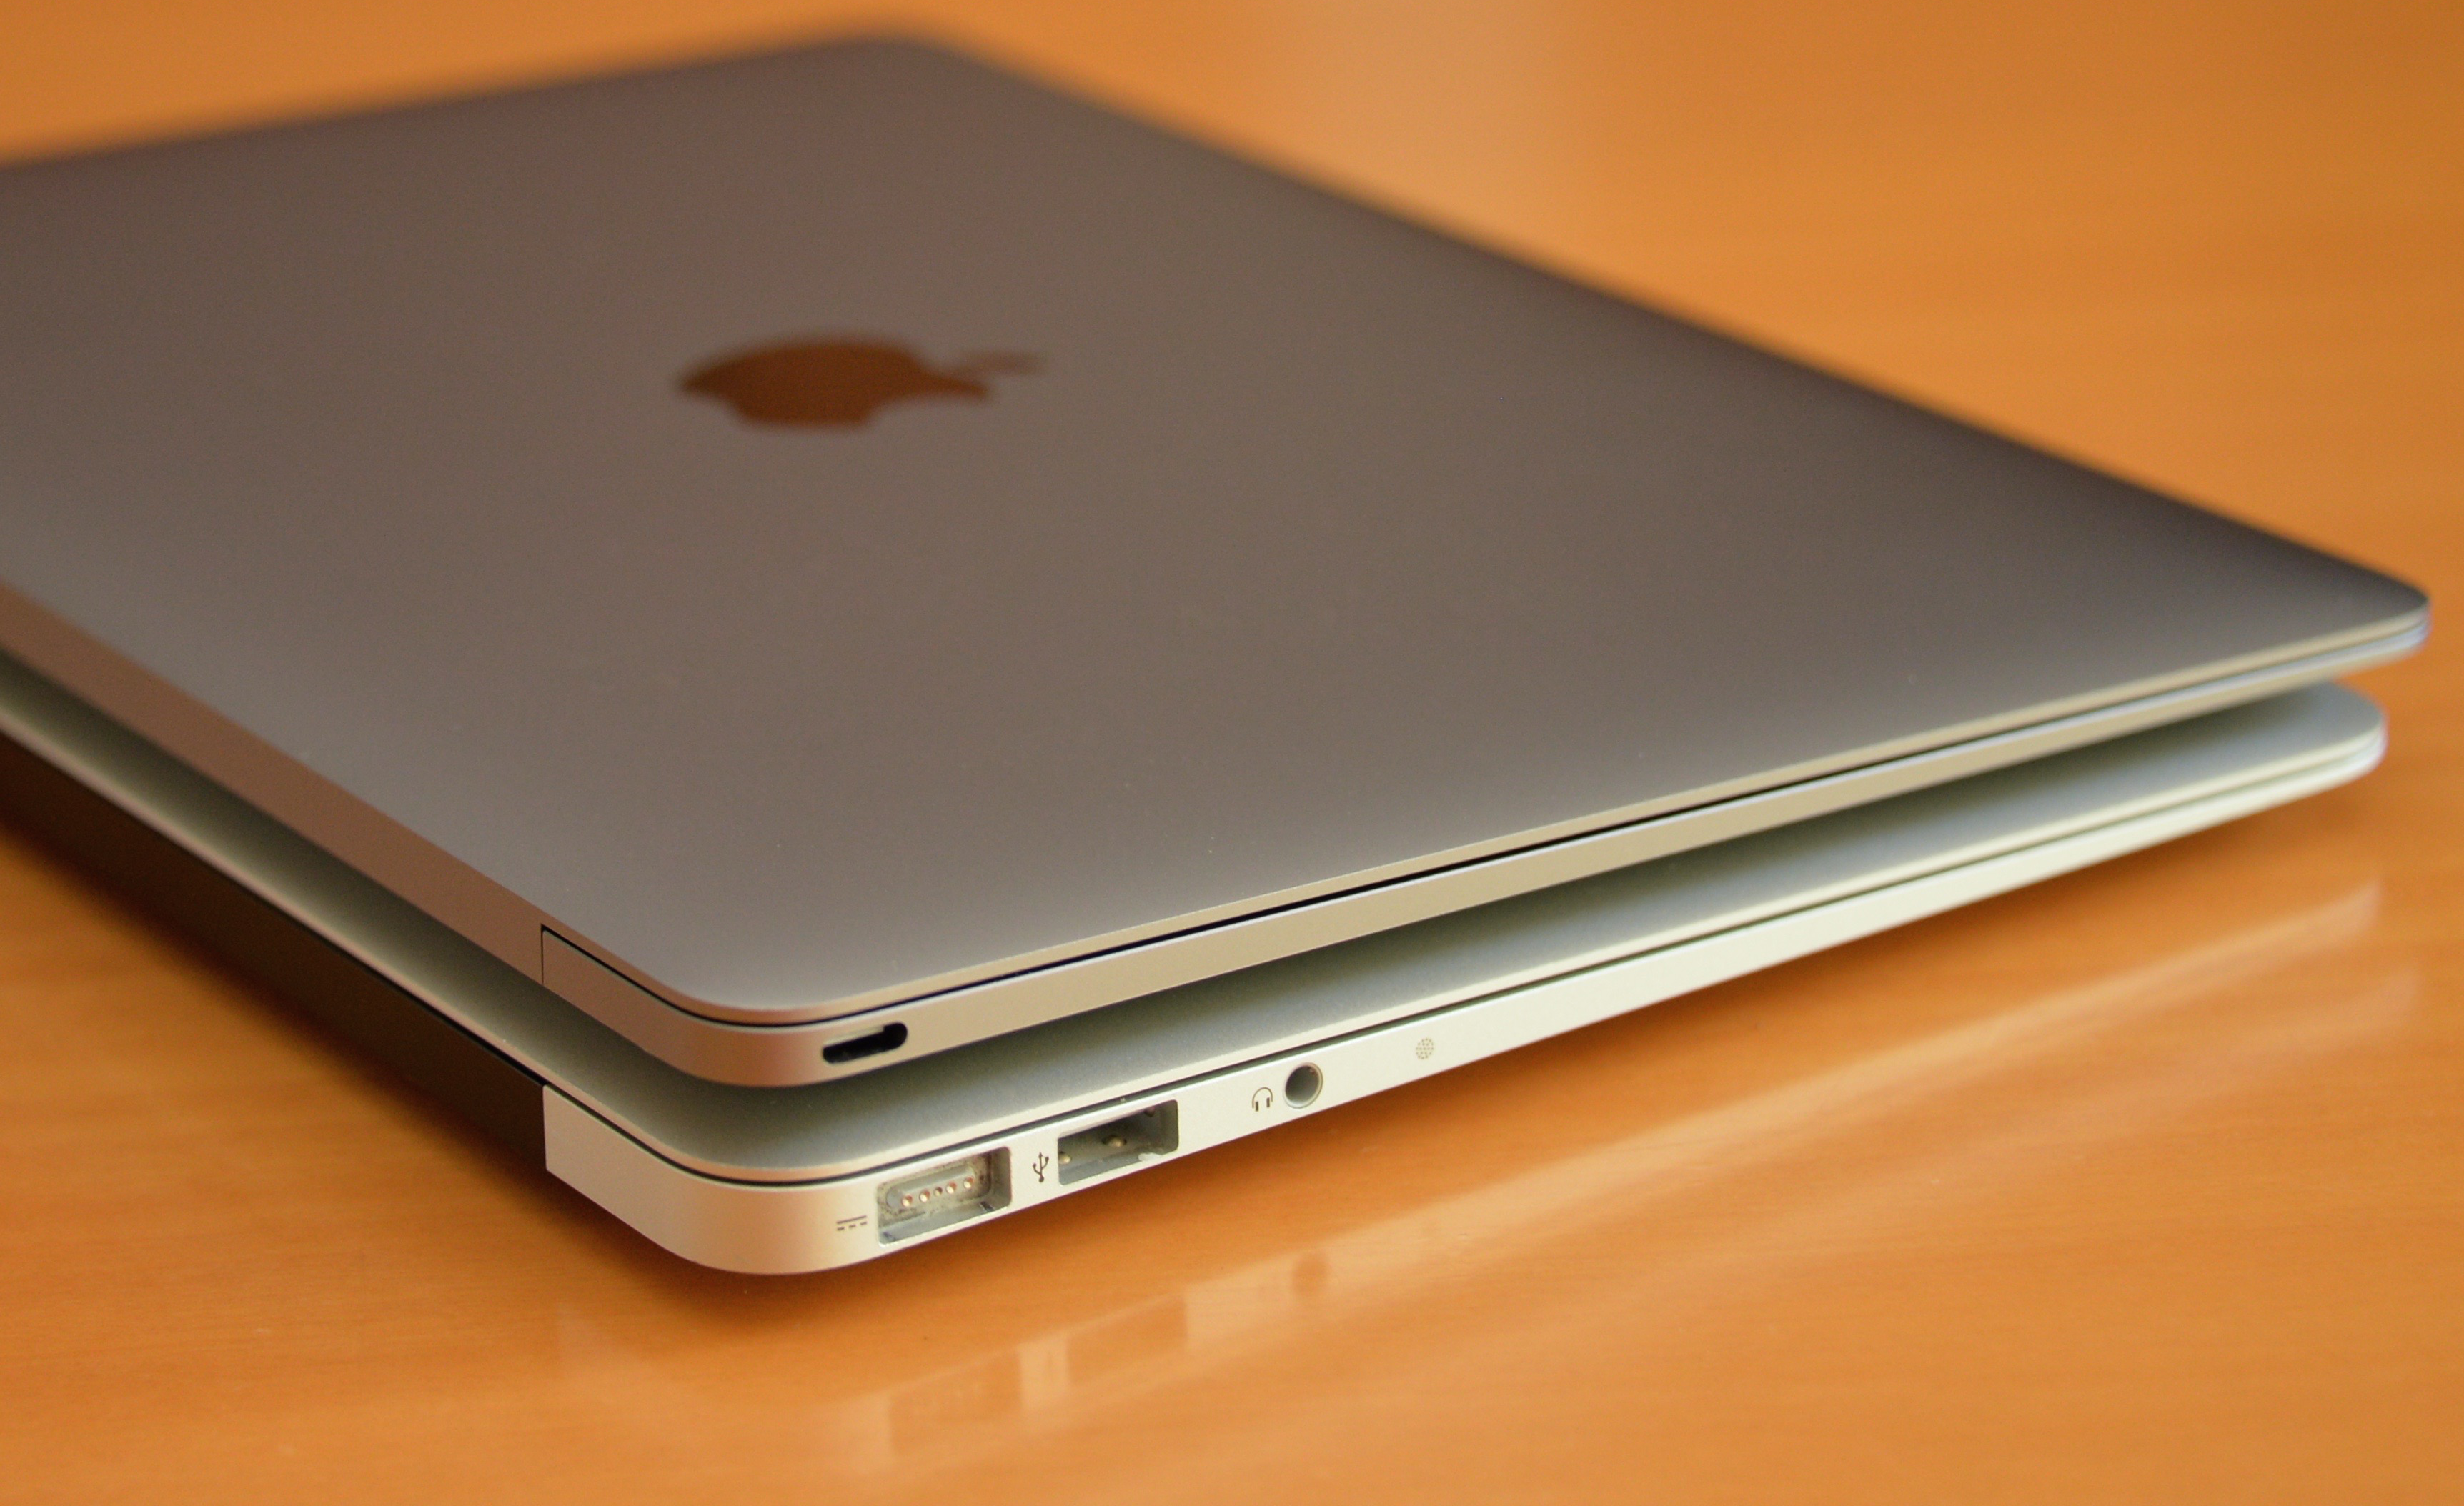 apple set to release newest macbook air tech headlines. Black Bedroom Furniture Sets. Home Design Ideas